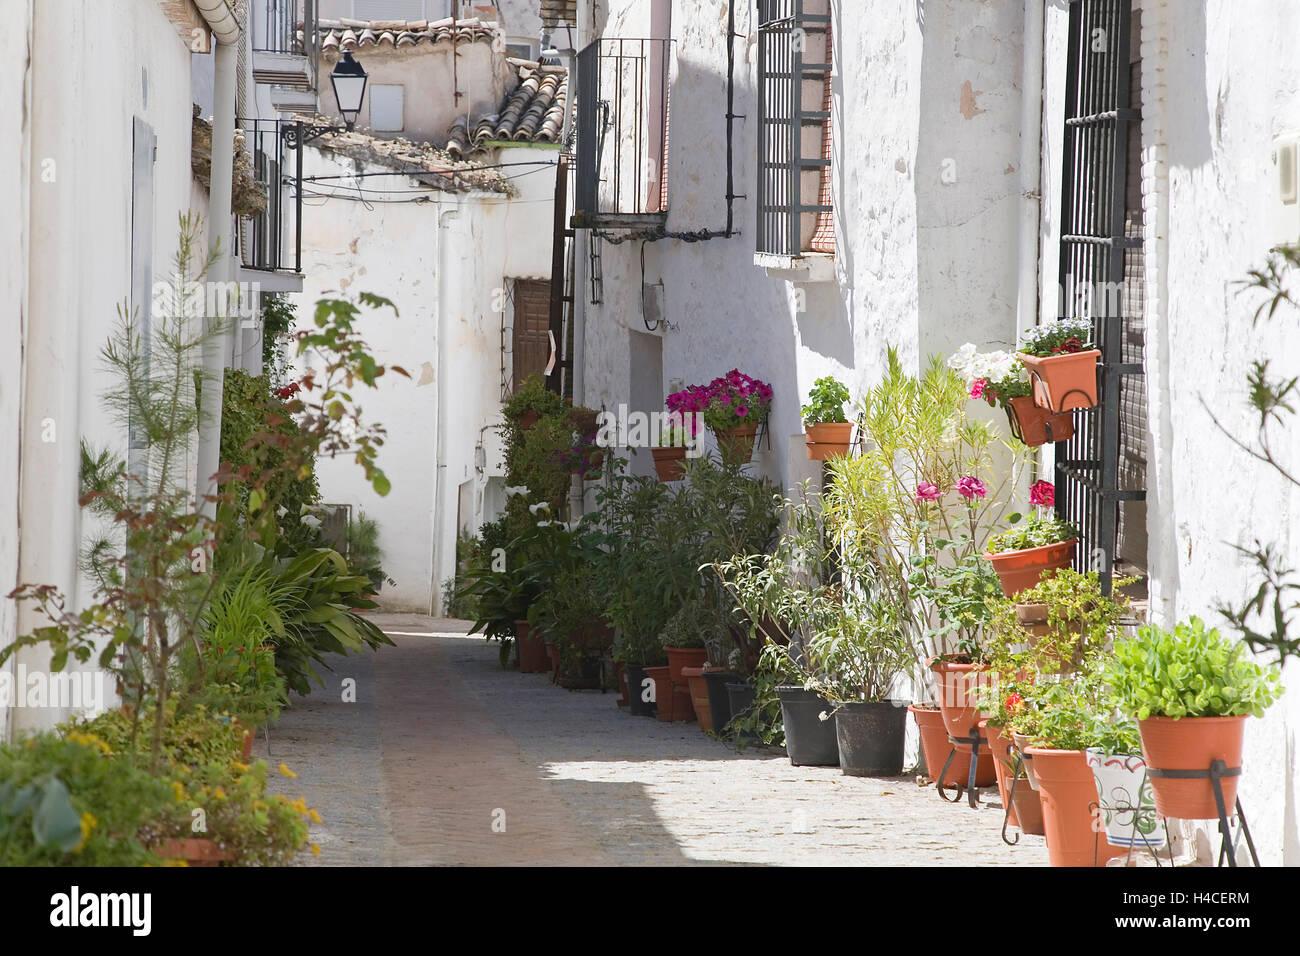 Street in Iznatoraf, Jaén Province, Andalusia, Spain - Stock Image